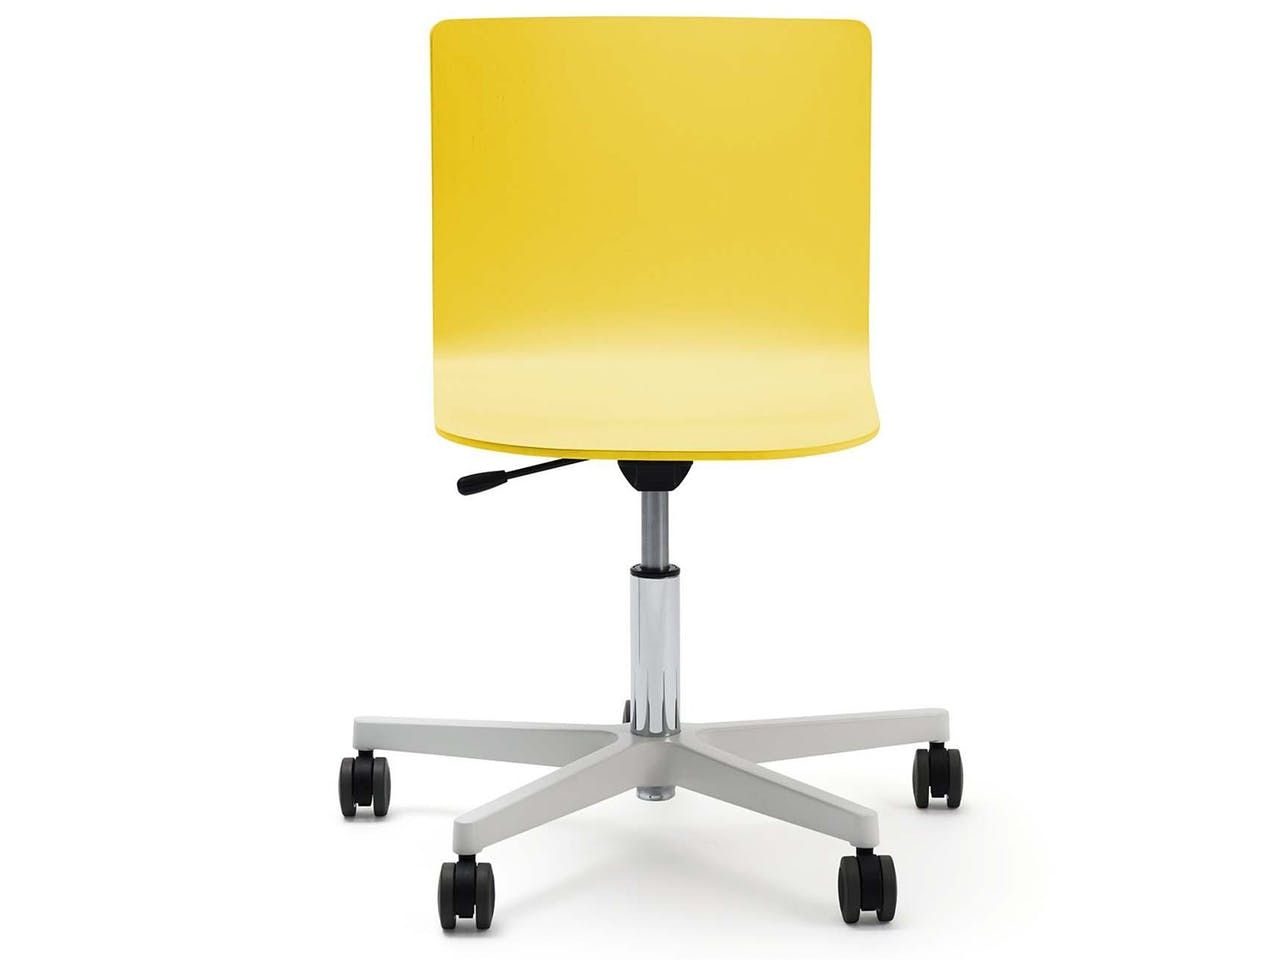 Bürostuhl Glyph, Drehkreuz mit Rollen, 750 - 880 x 610 x 610 mm, zinkgelb RAL 1018